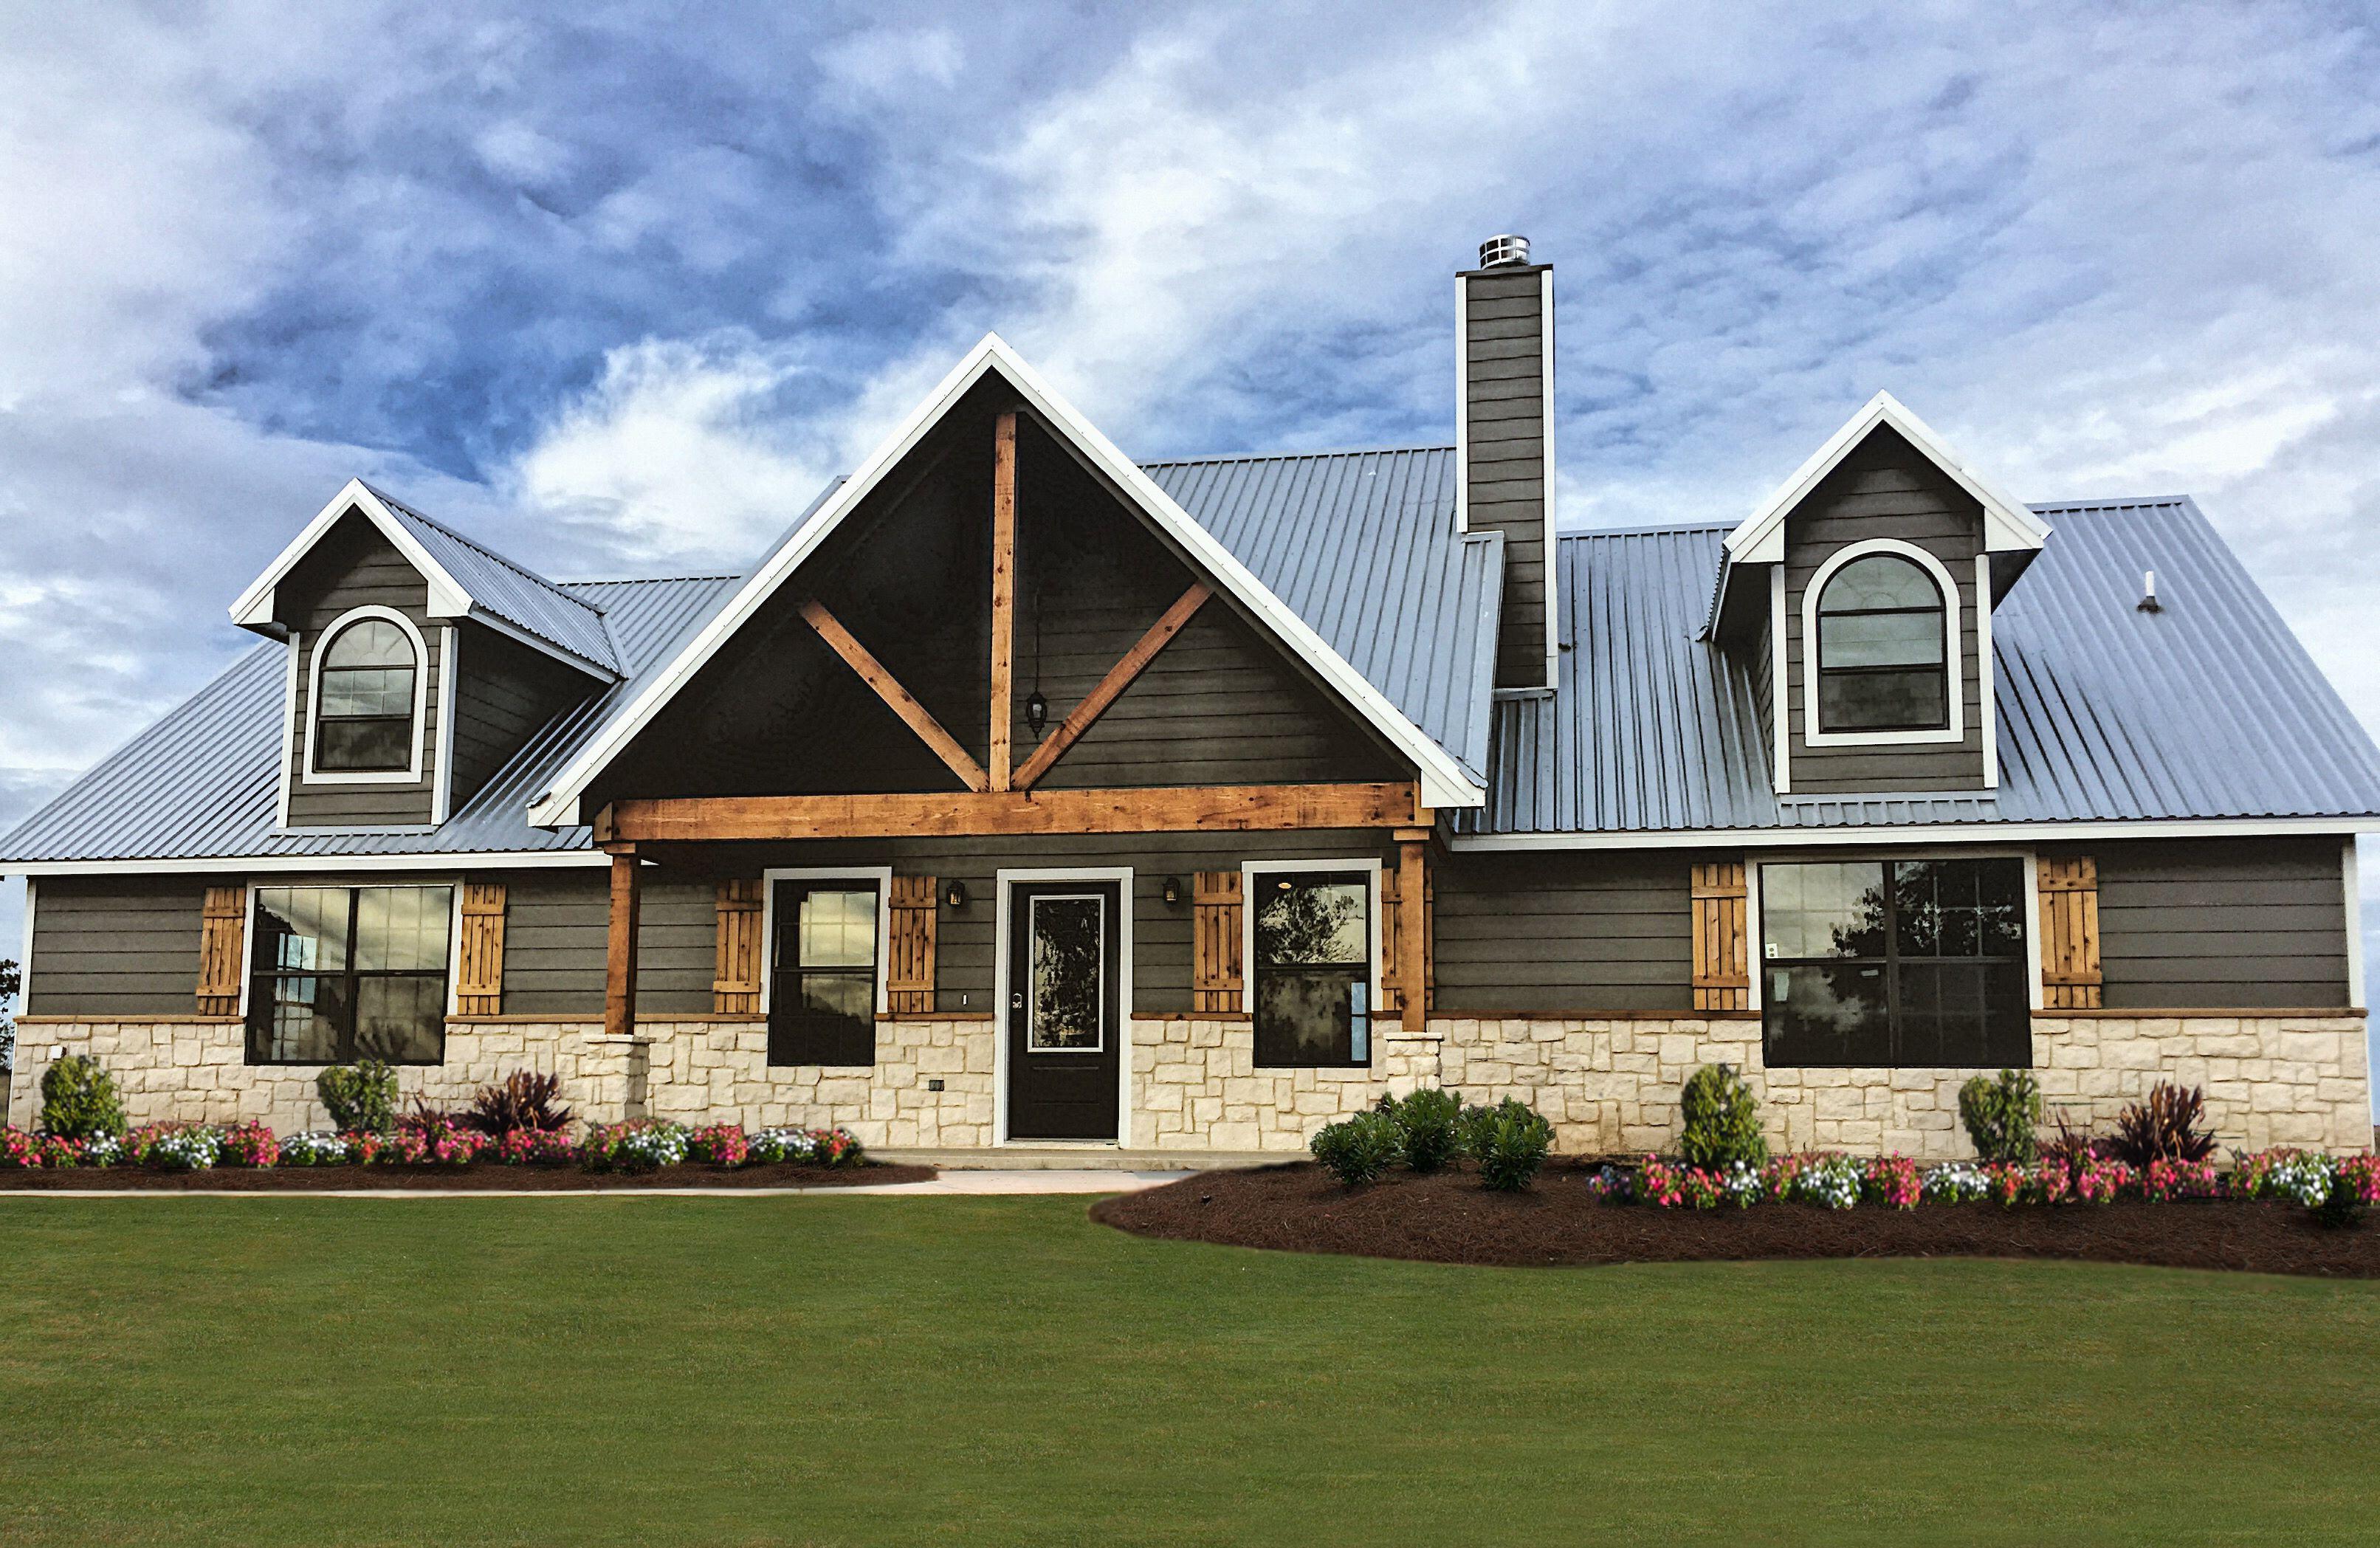 Lipan Texas Barn House Plans Metal Building Home Building A House